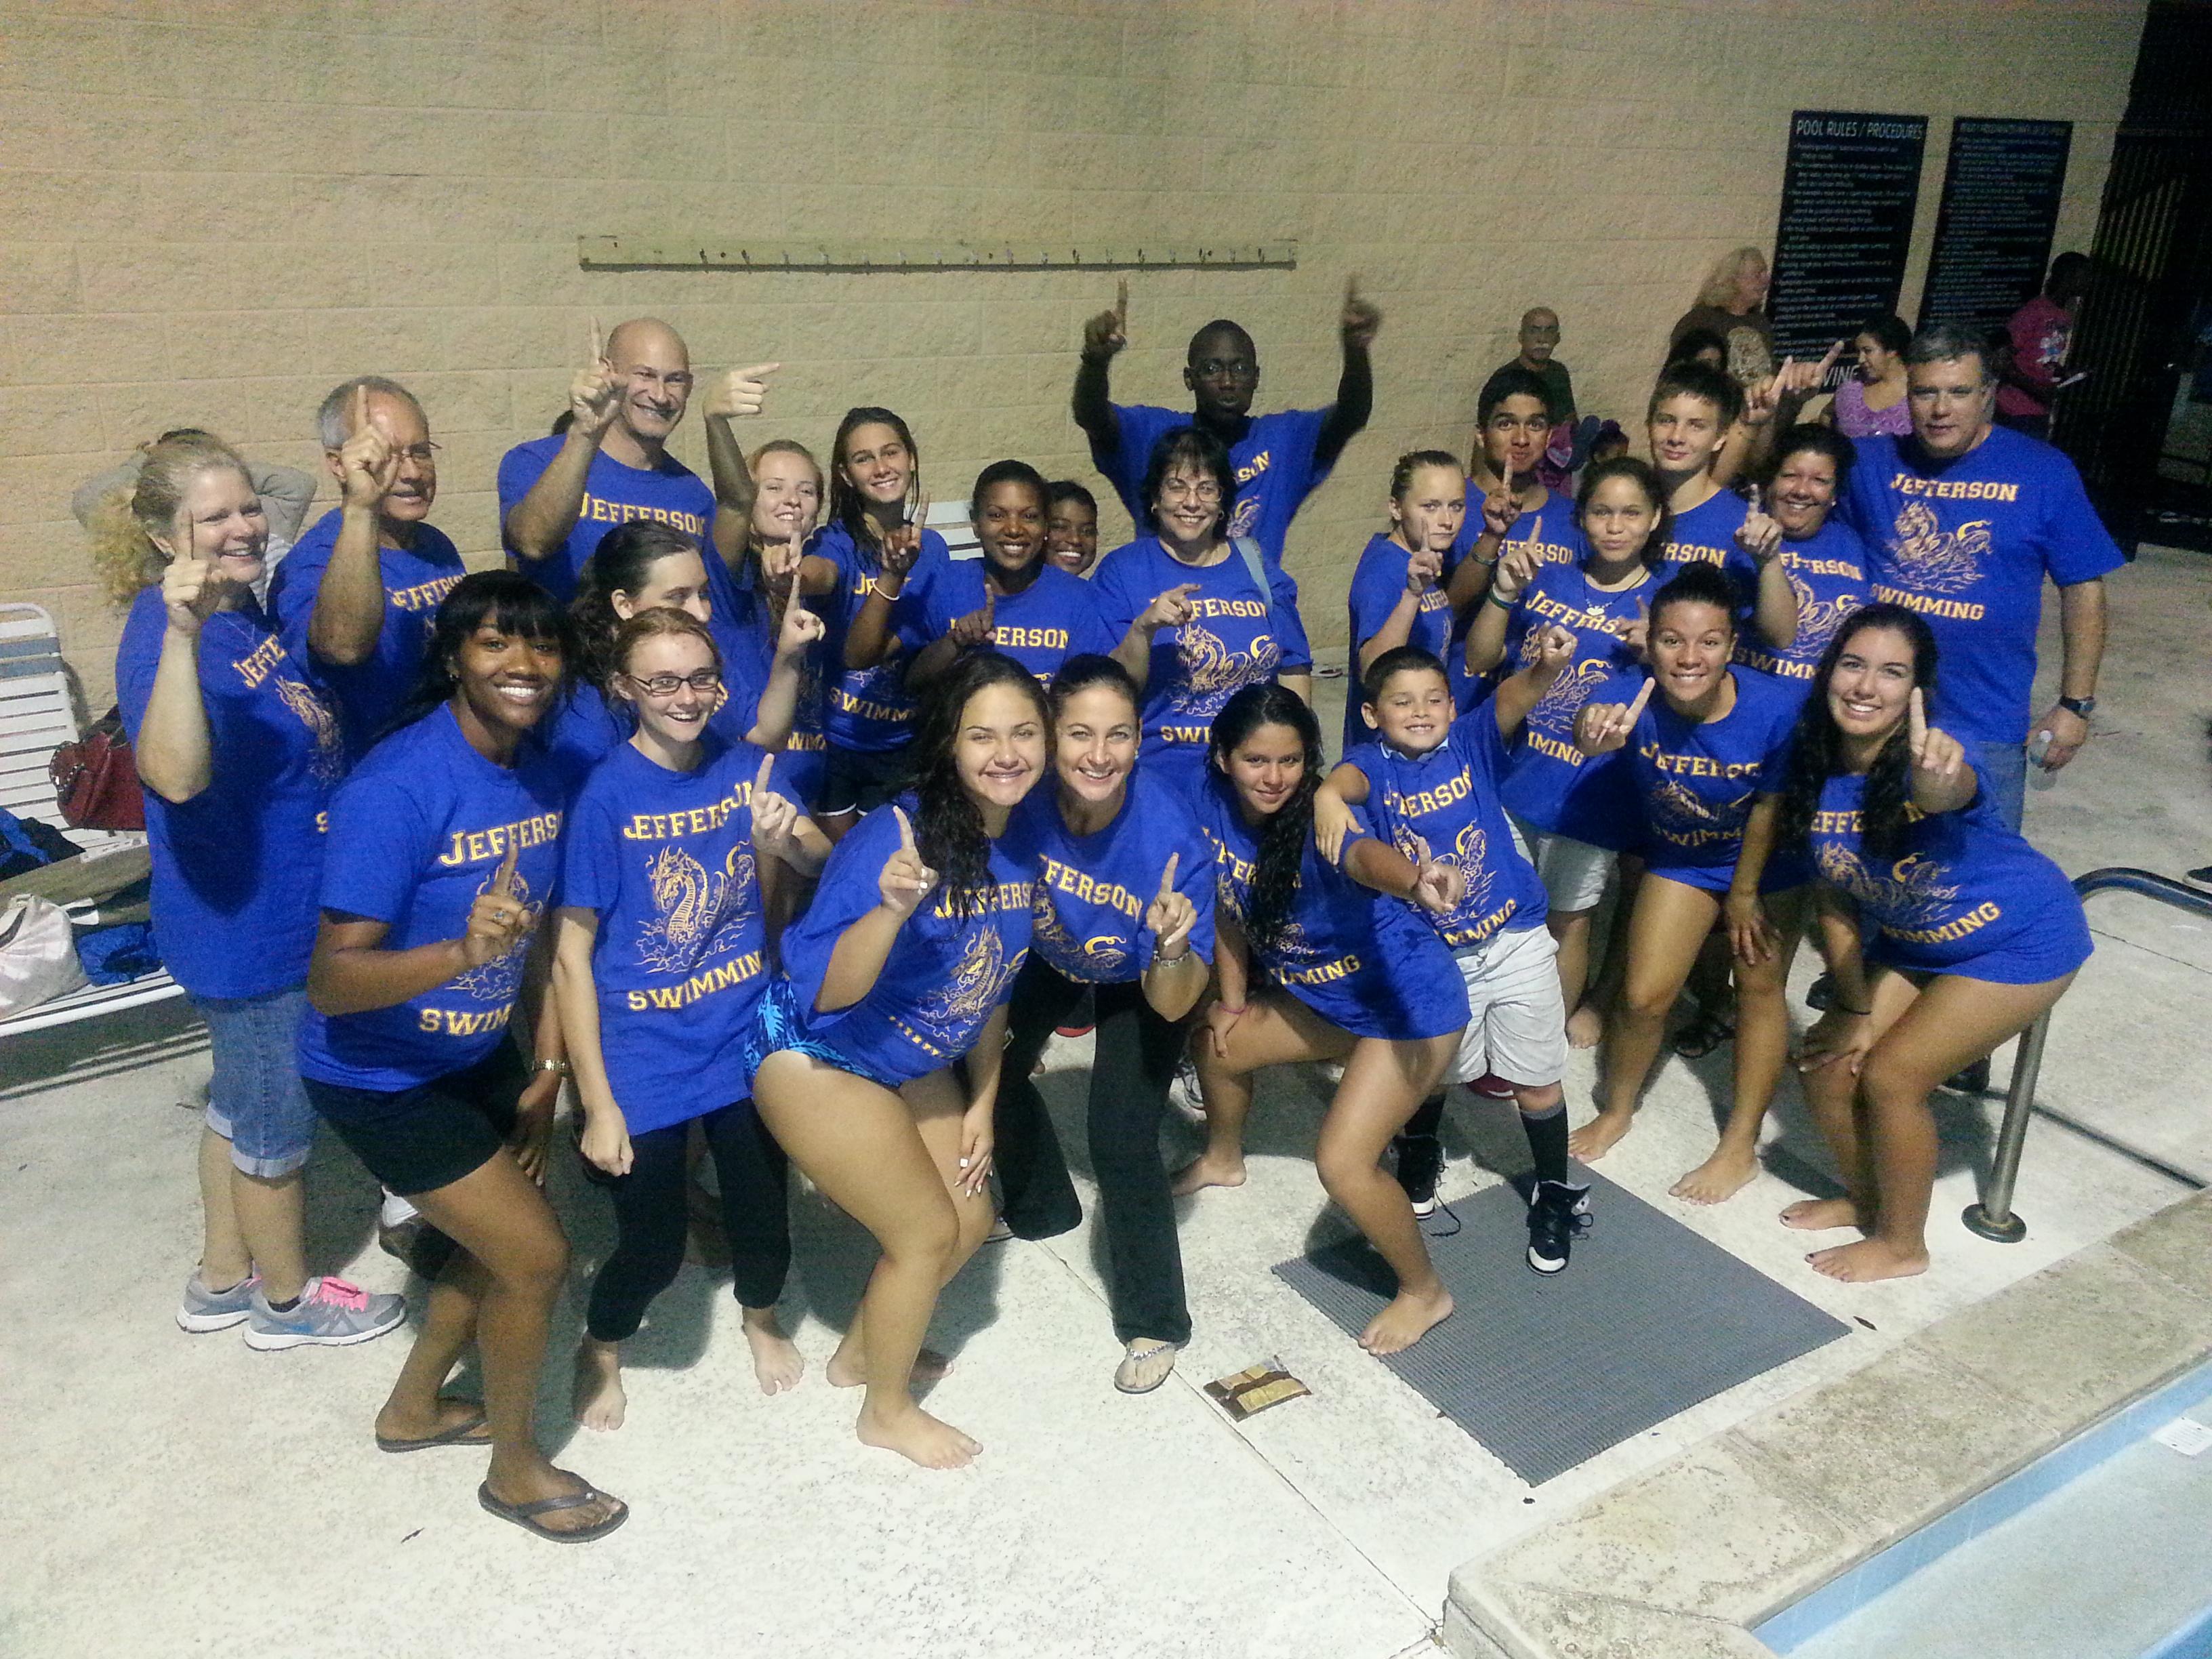 Shirt design tampa - Jefferson High Swim Team Tampa Fl T Shirt Photo